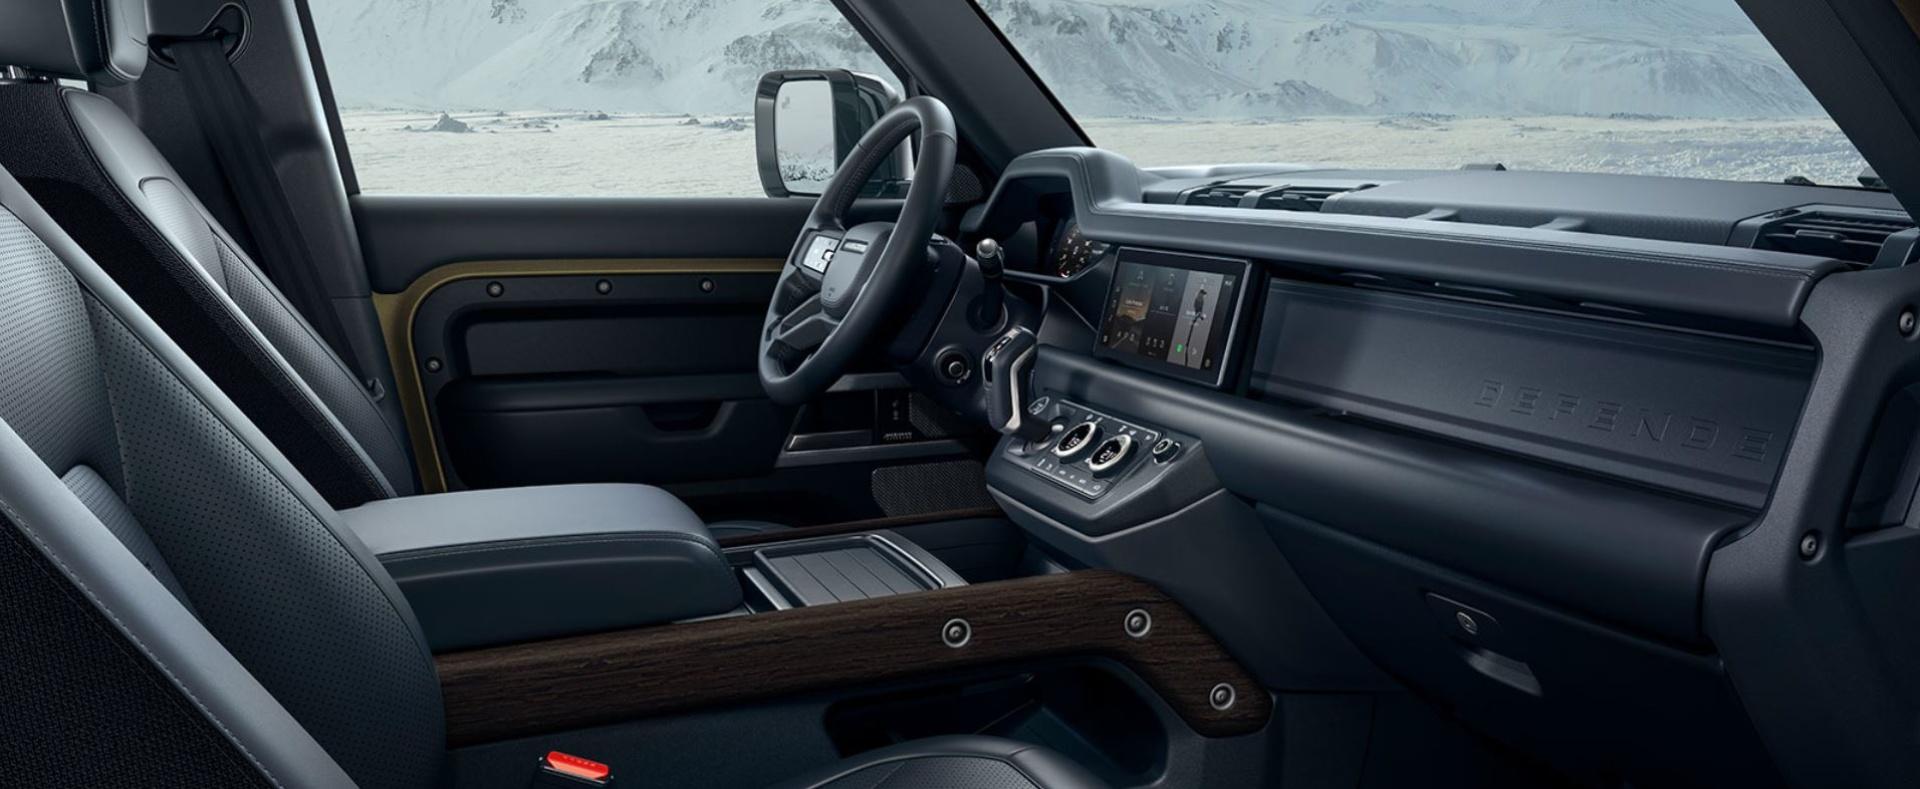 Land Rover-Land Rover Defender 90-1